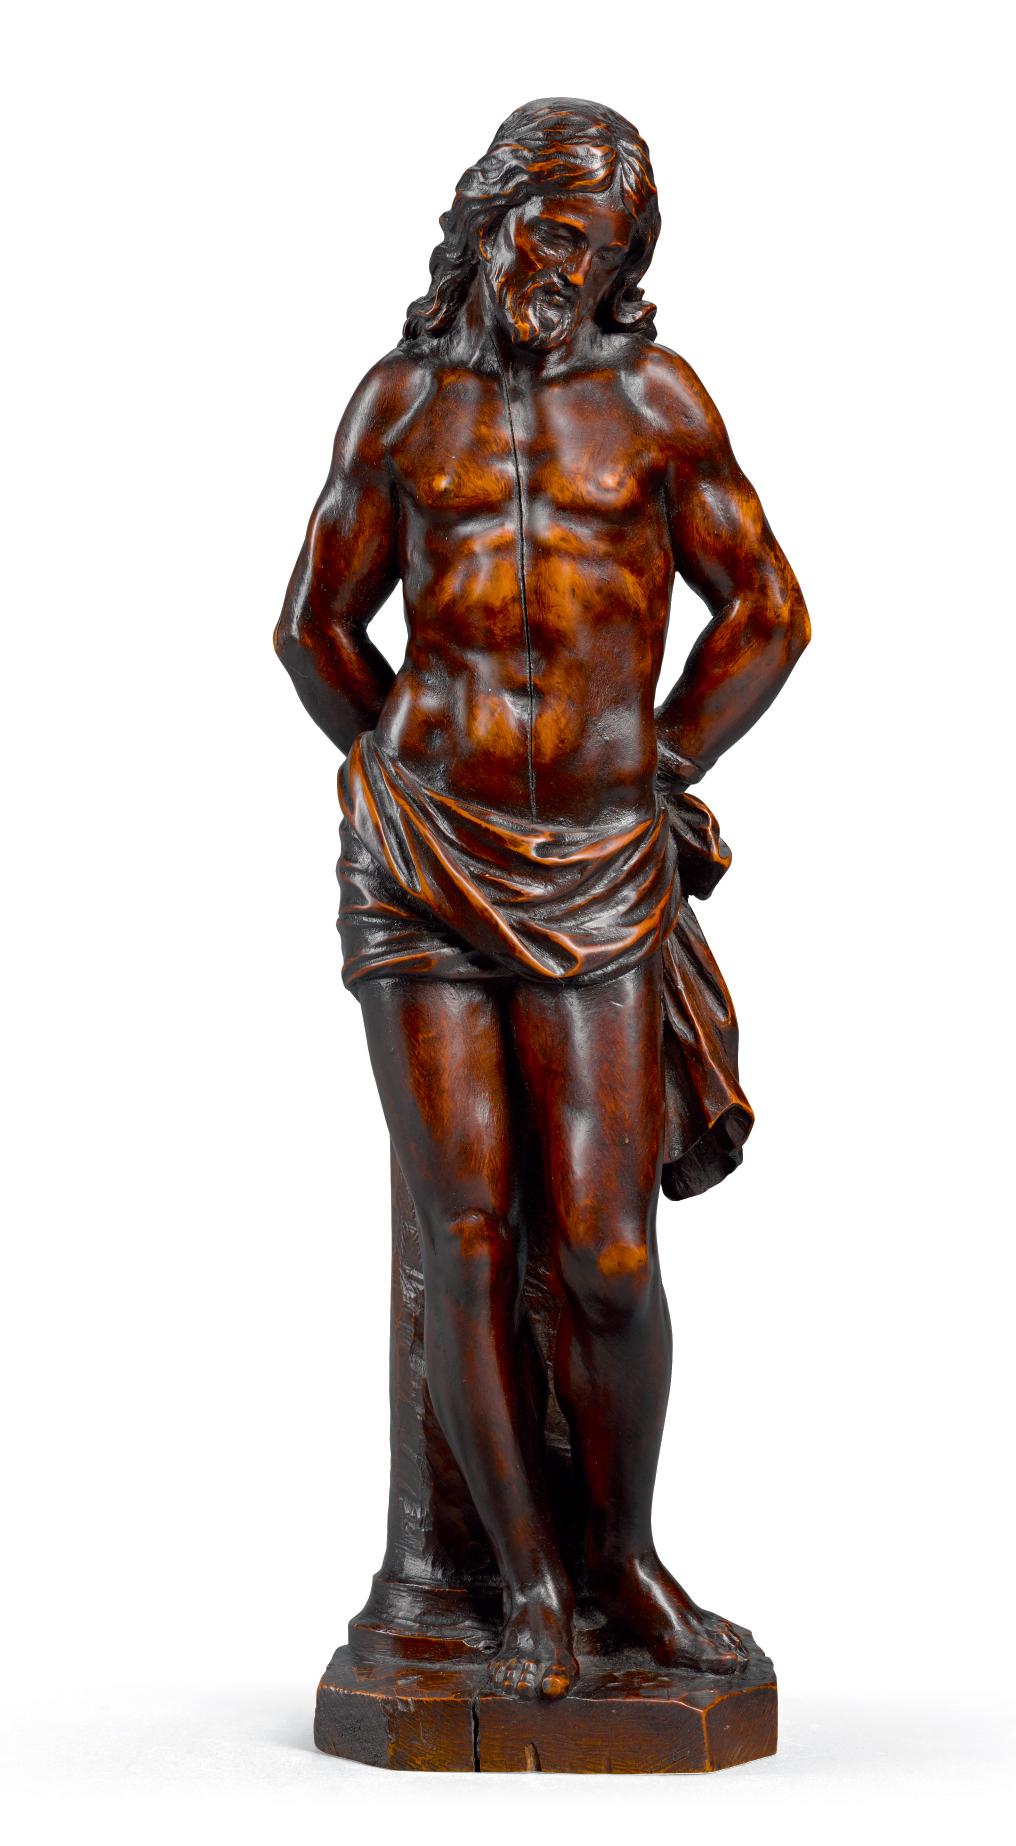 ITALIAN, 18TH CENTURY | CHRIST AT THE COLUMN